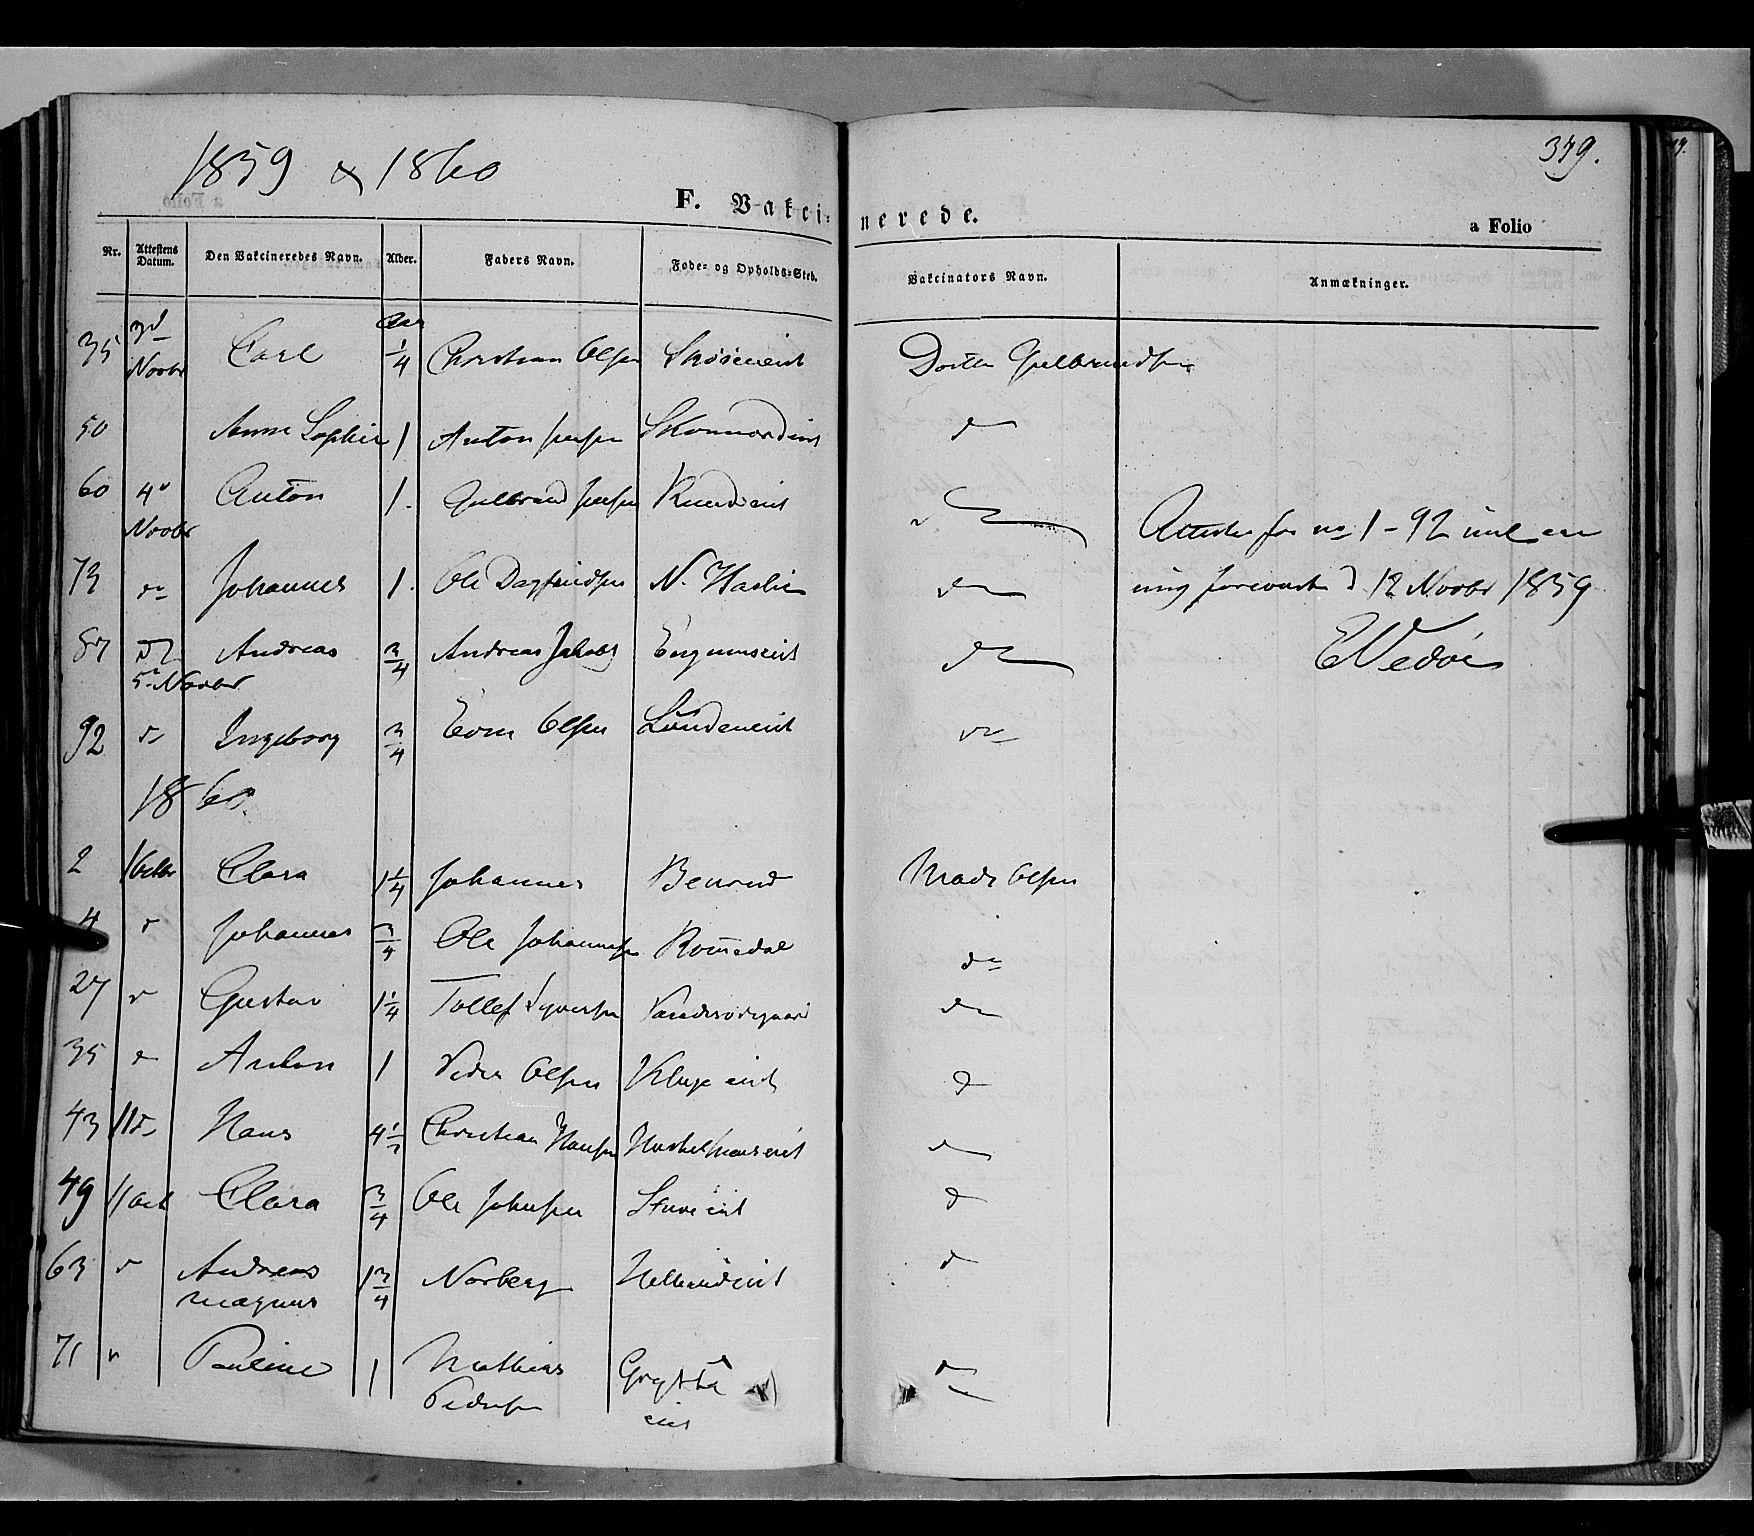 SAH, Biri prestekontor, Ministerialbok nr. 5, 1843-1854, s. 349